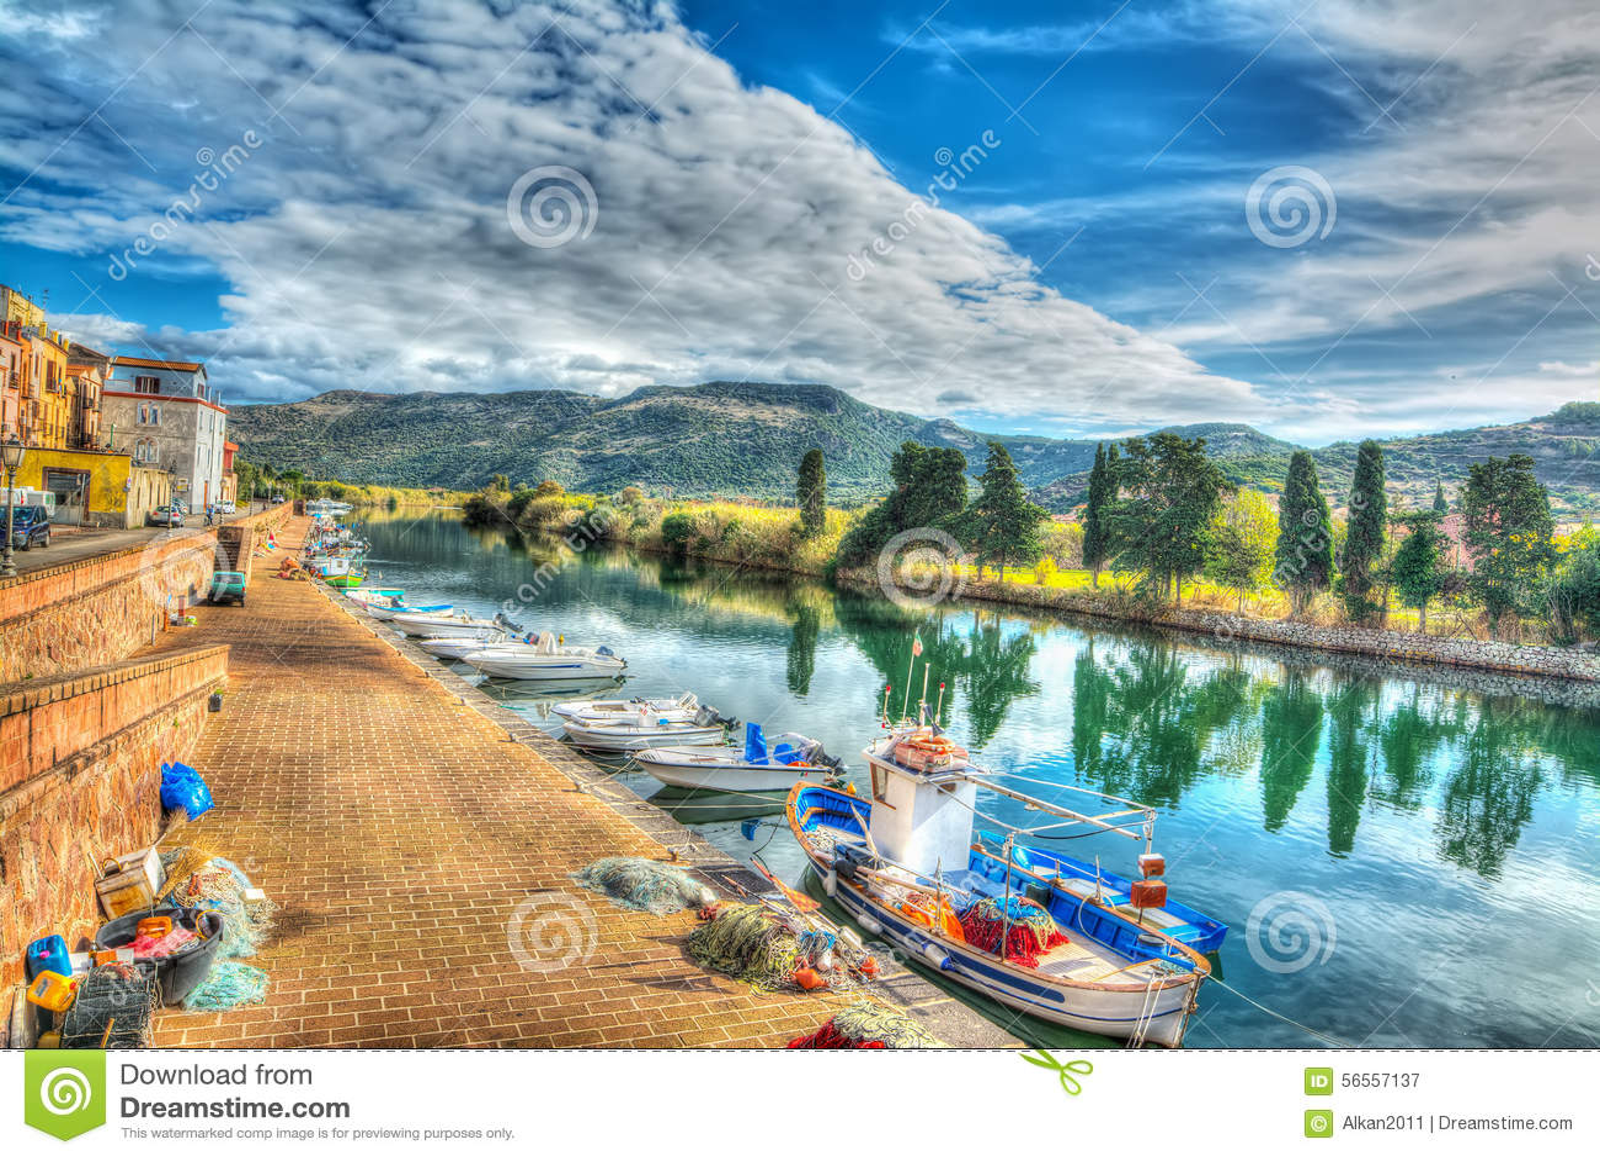 Download Ποταμός Temo κάτω από έναν νεφελώδη ουρανό στο Hdr Στοκ Εικόνα - εικόνα από χωριό, δραματικός: 56557137